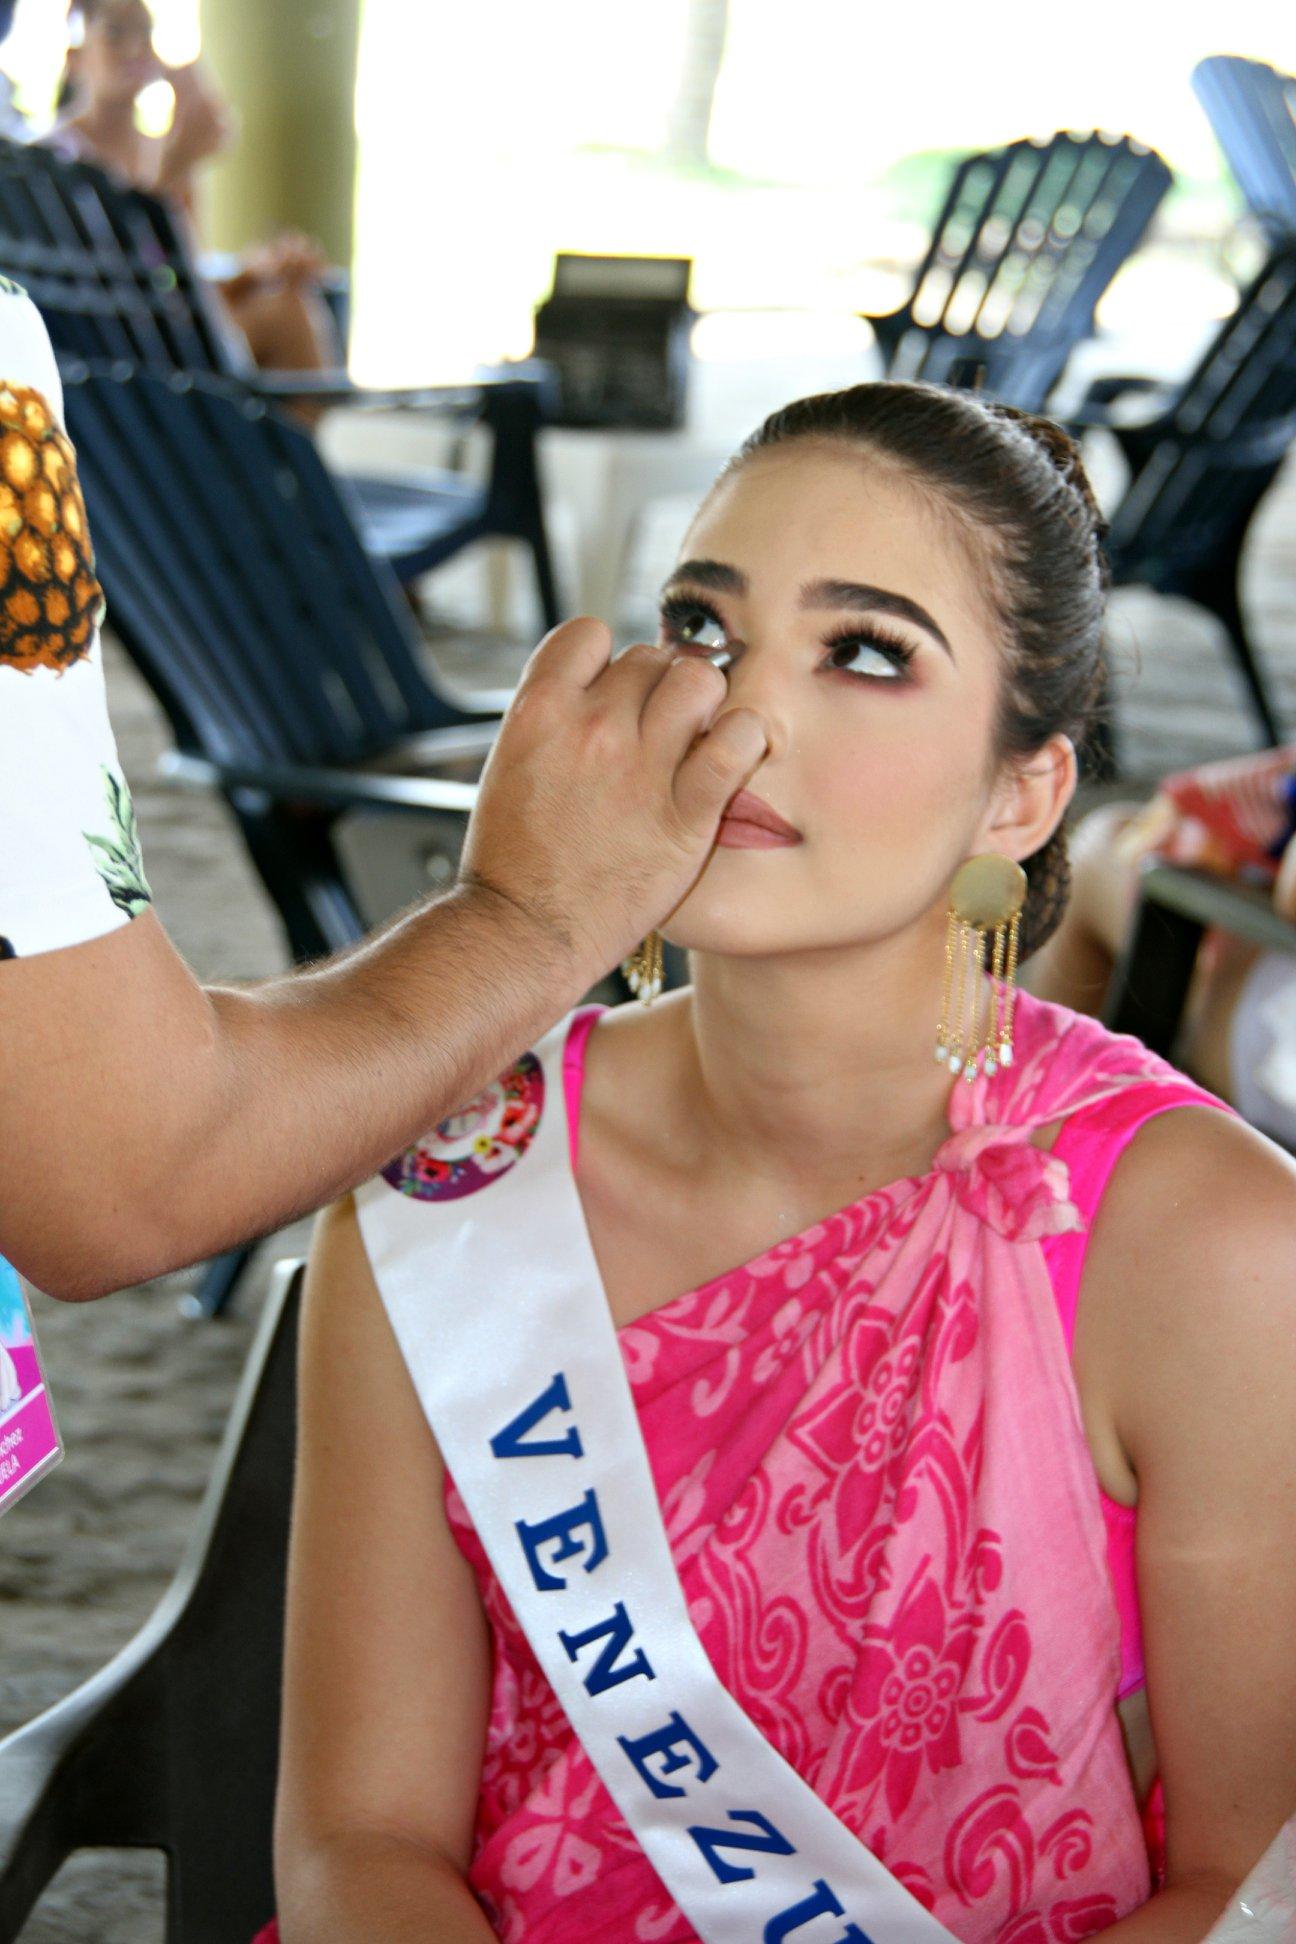 daniela di venere, top 12 de miss teen mundial 2019. - Página 4 61051610